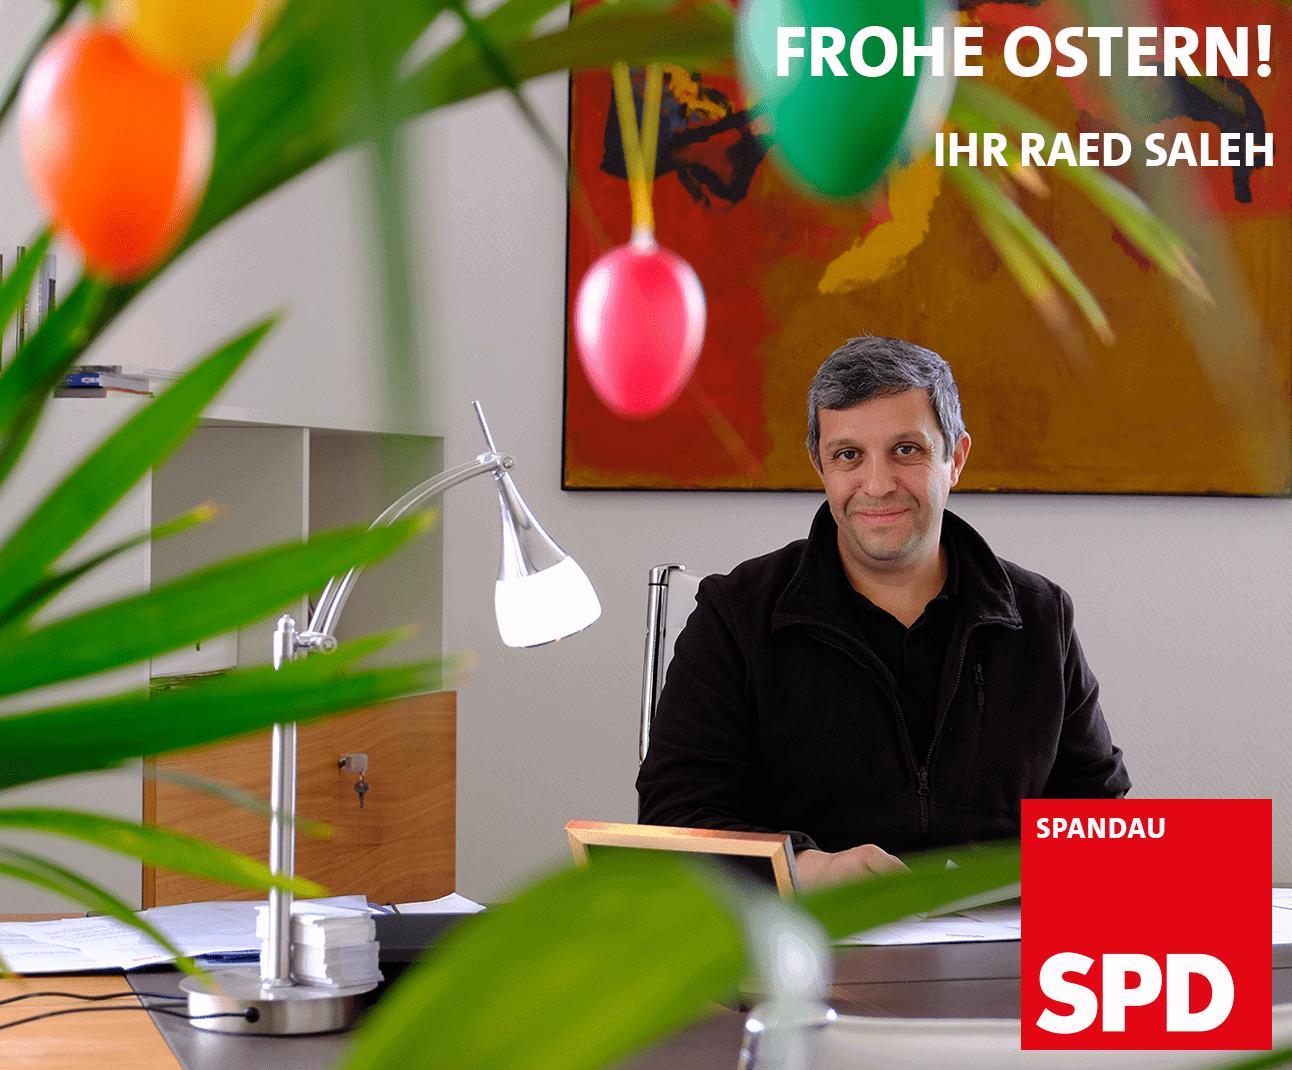 Ostergruß der Spandauer SPD